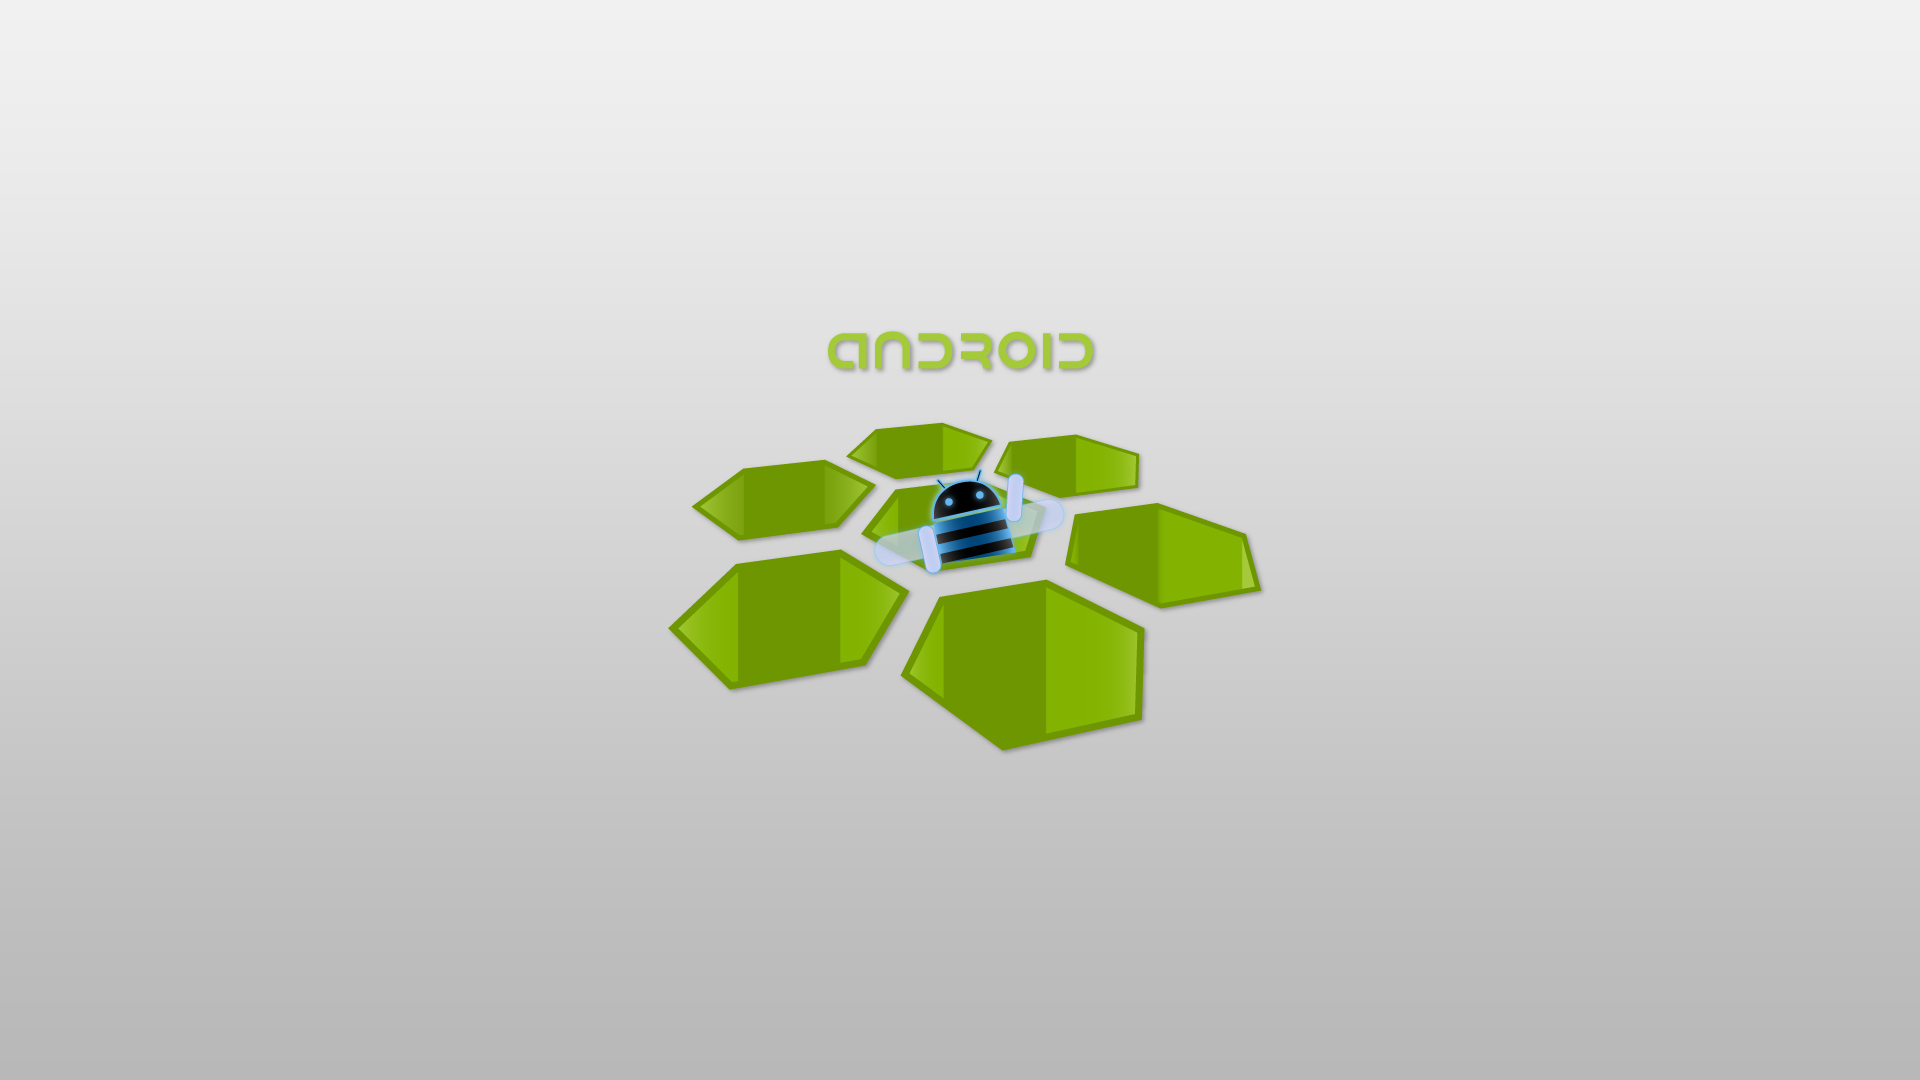 Android Studio Wallpaper Hd ...